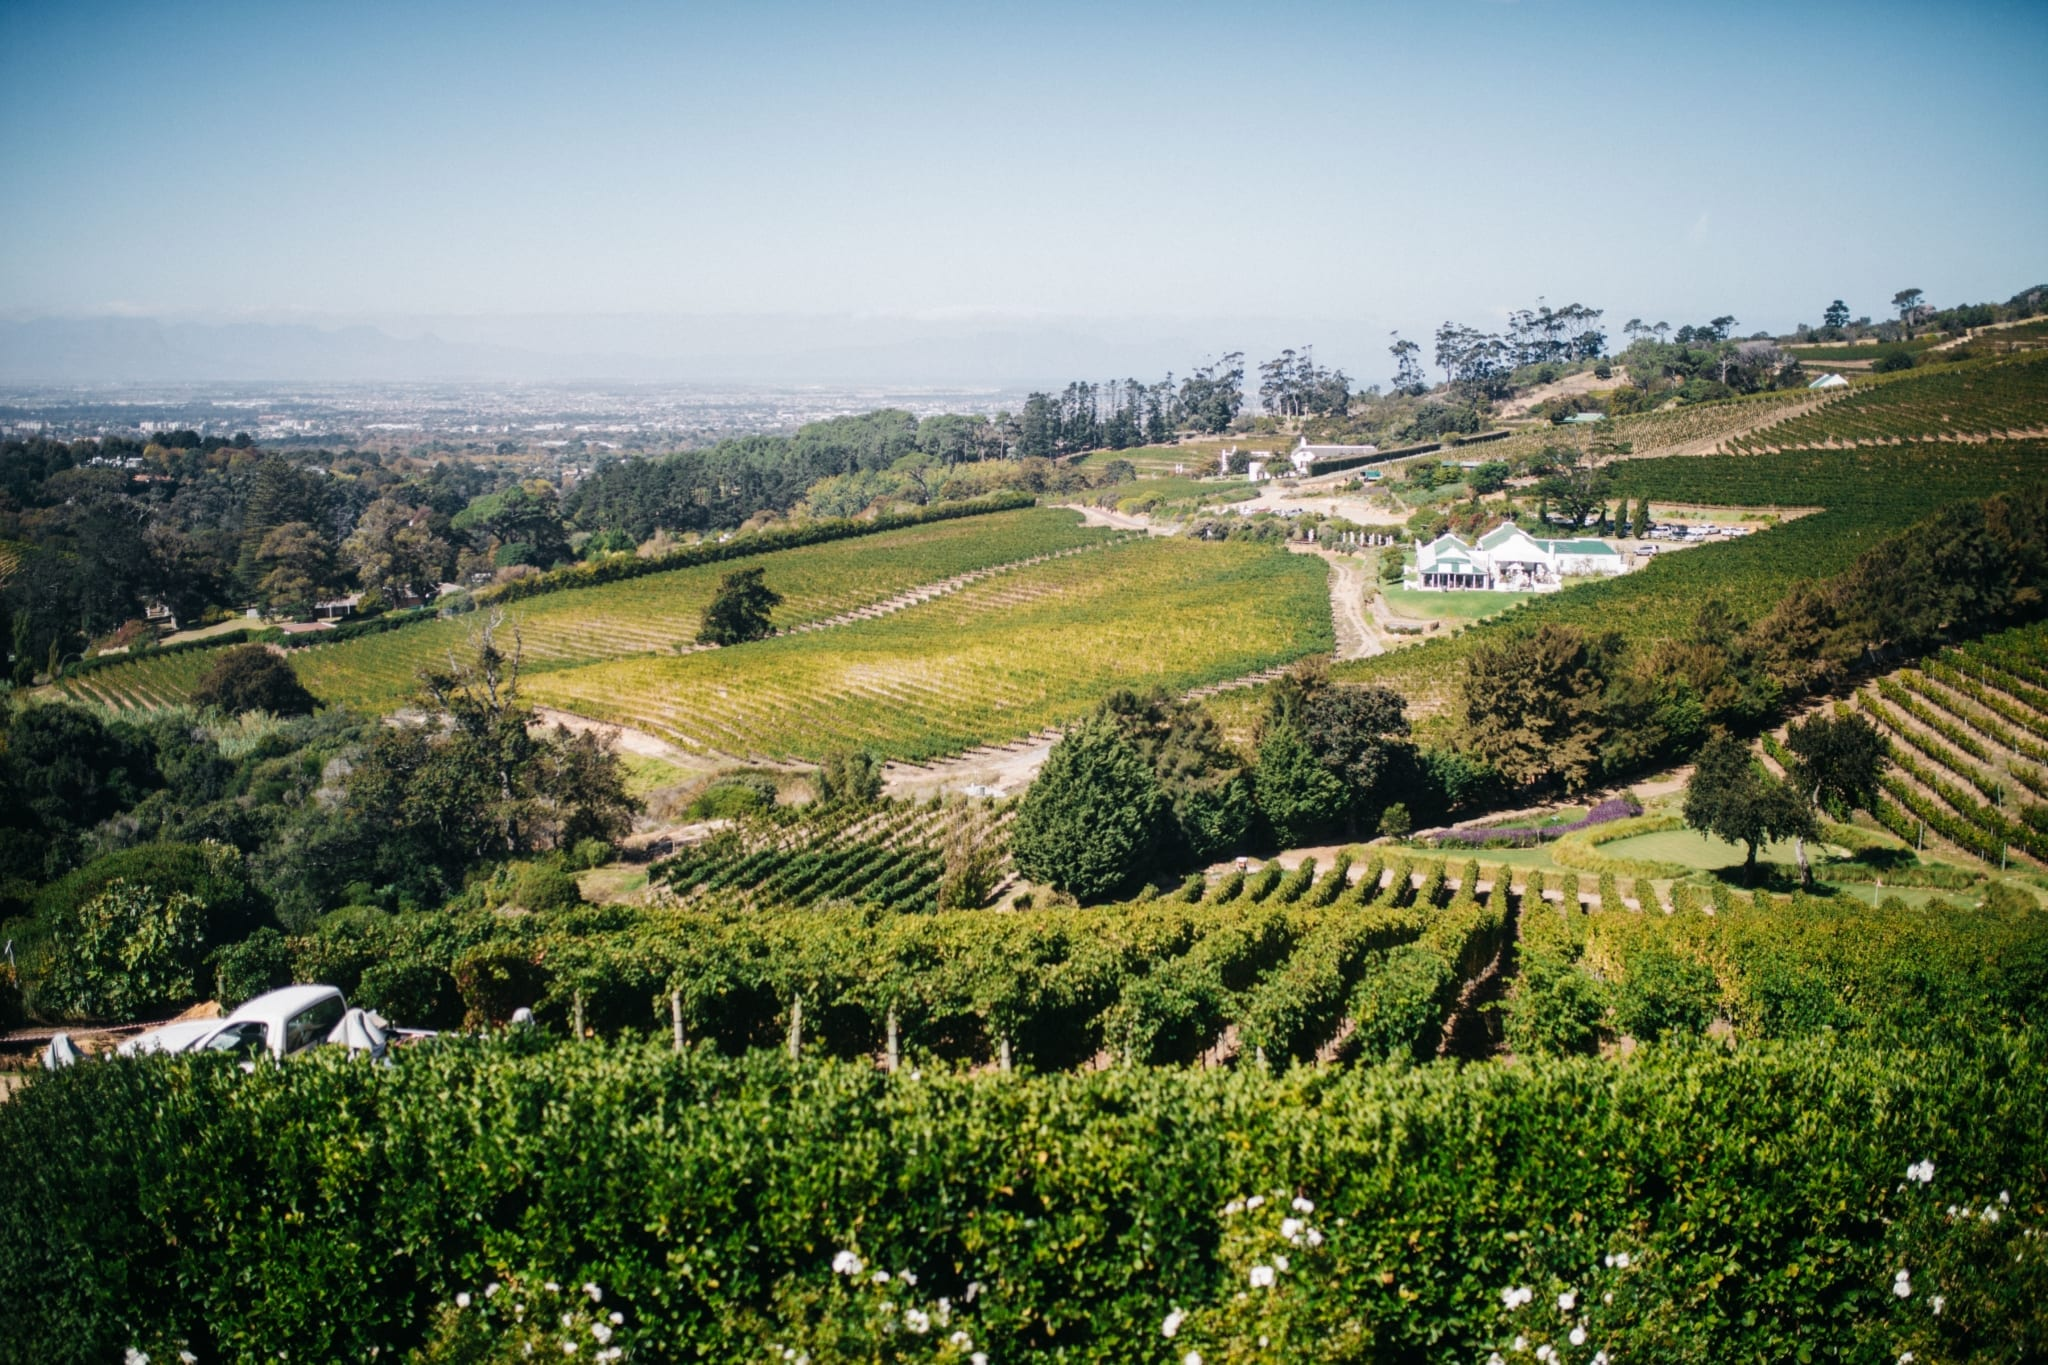 nature-landscape-green-vineyard-wine-winery-beautiful-south-africa-cape-town-wine-farm_t20_oEyN4A